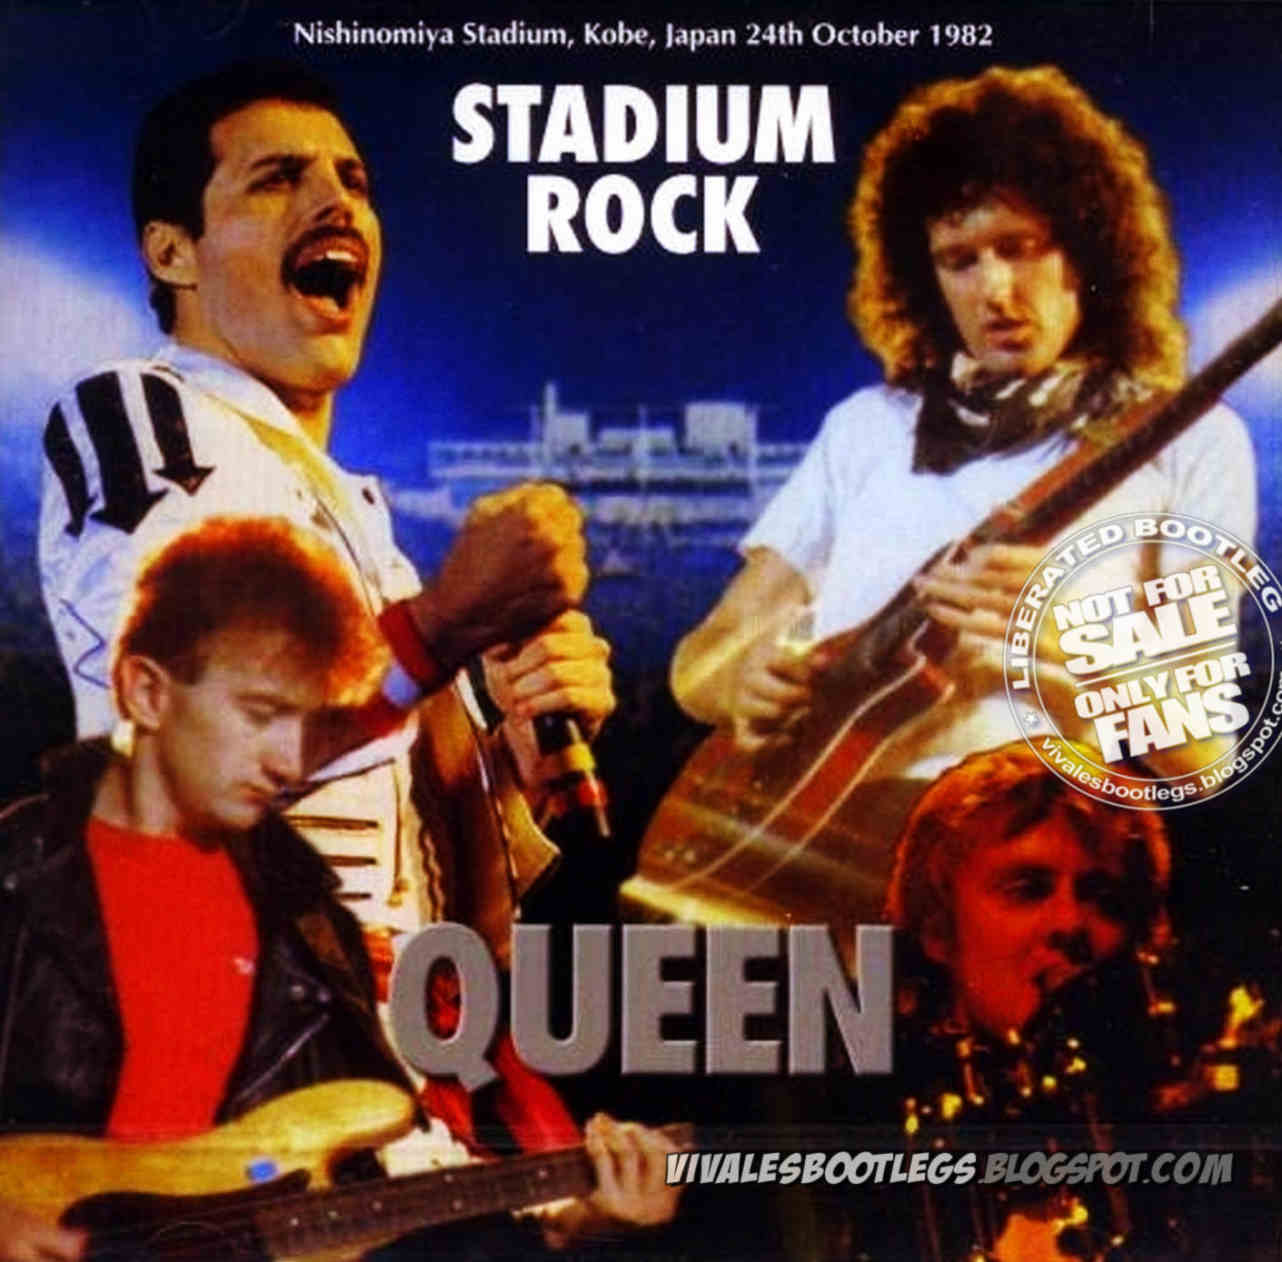 Queen - Spread Your Wings / Sheer Heart Attack